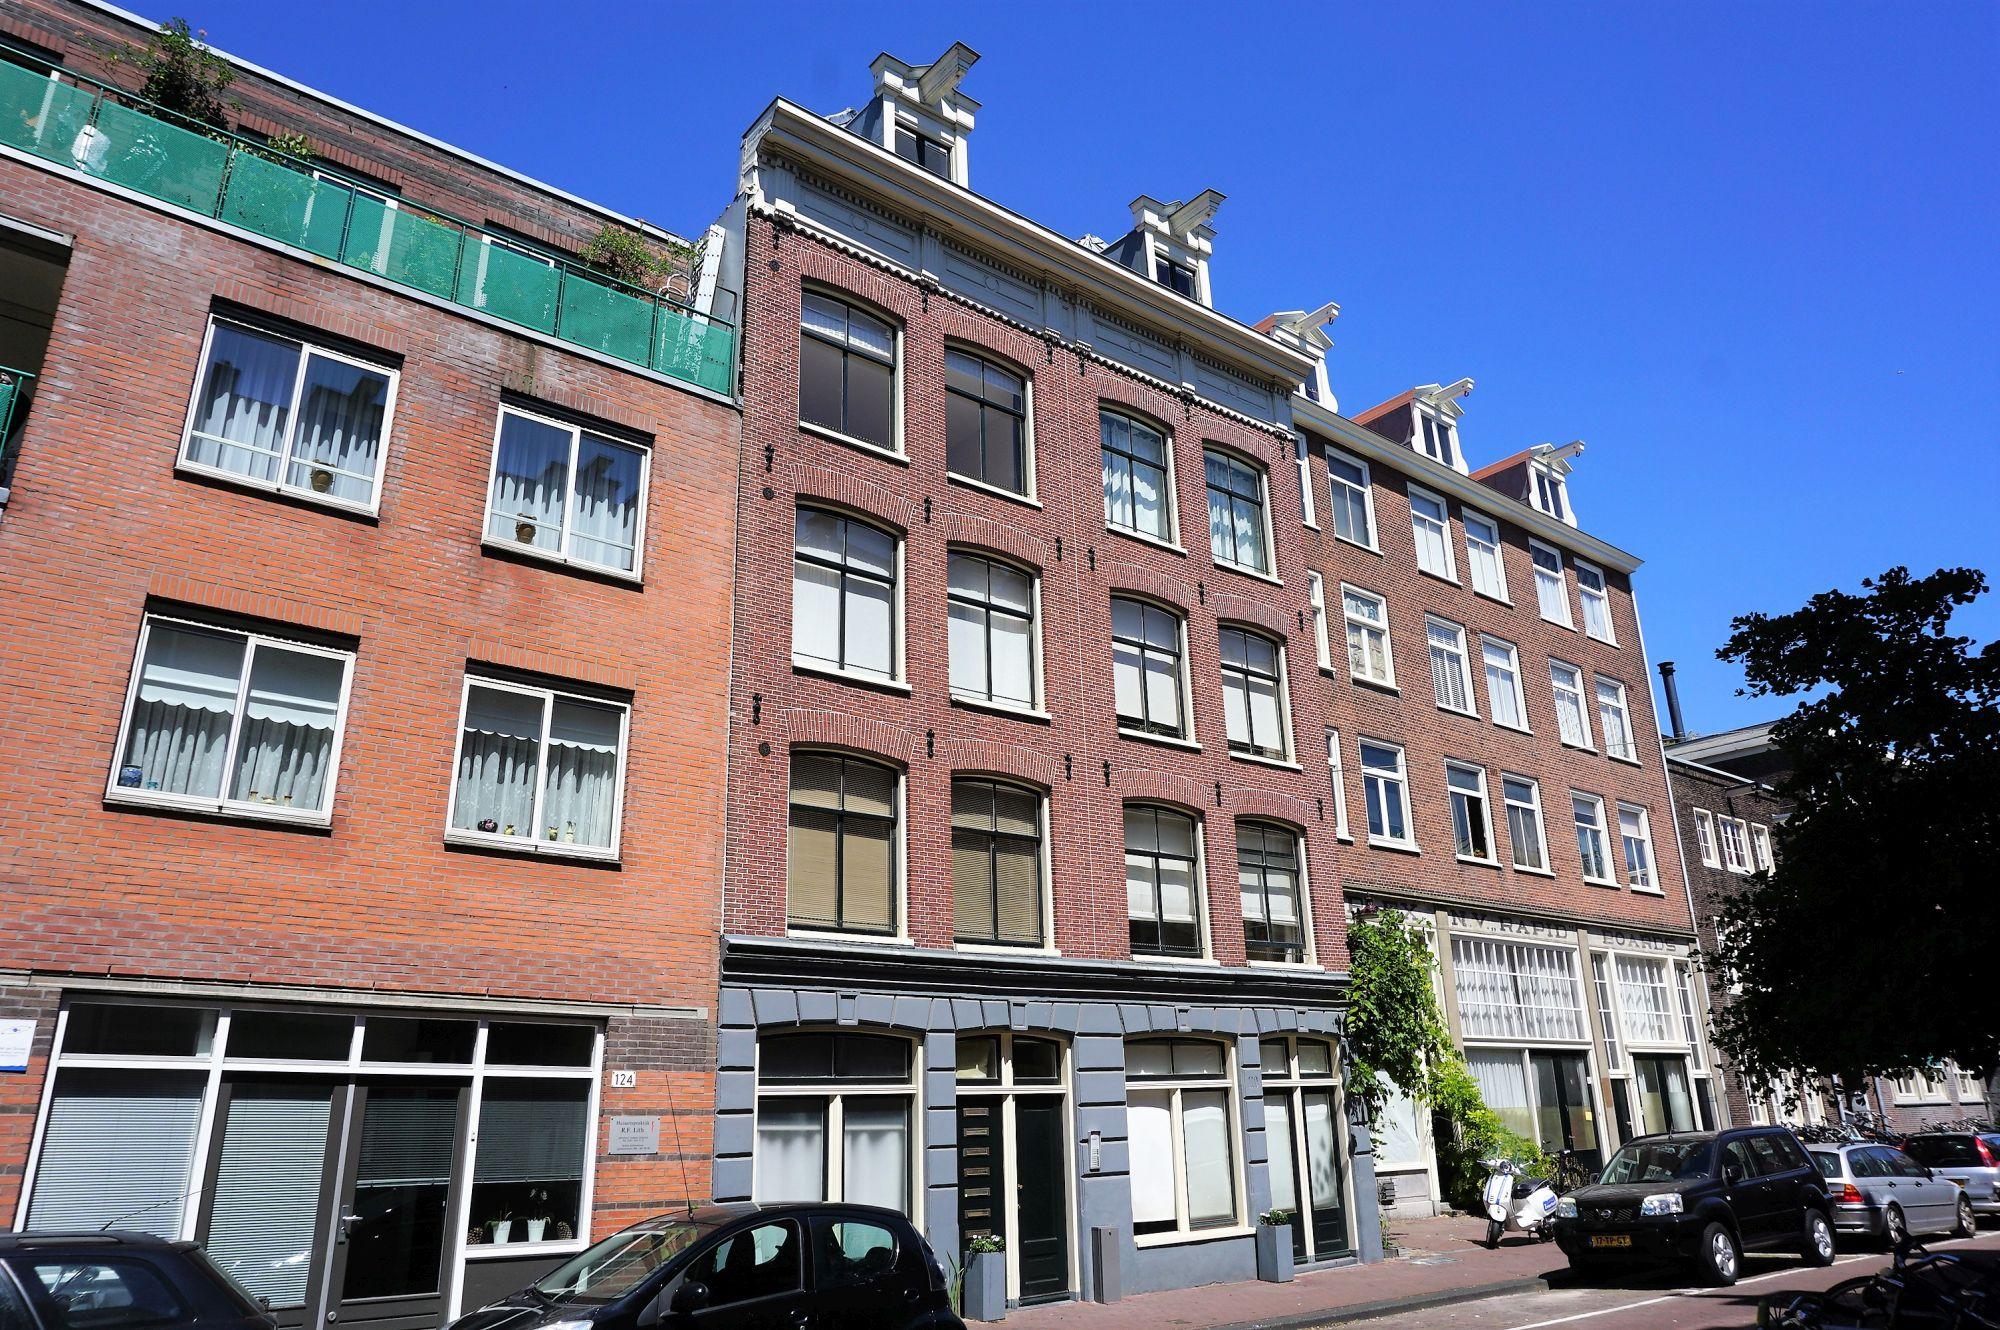 Willemsstraat, Amsterdam